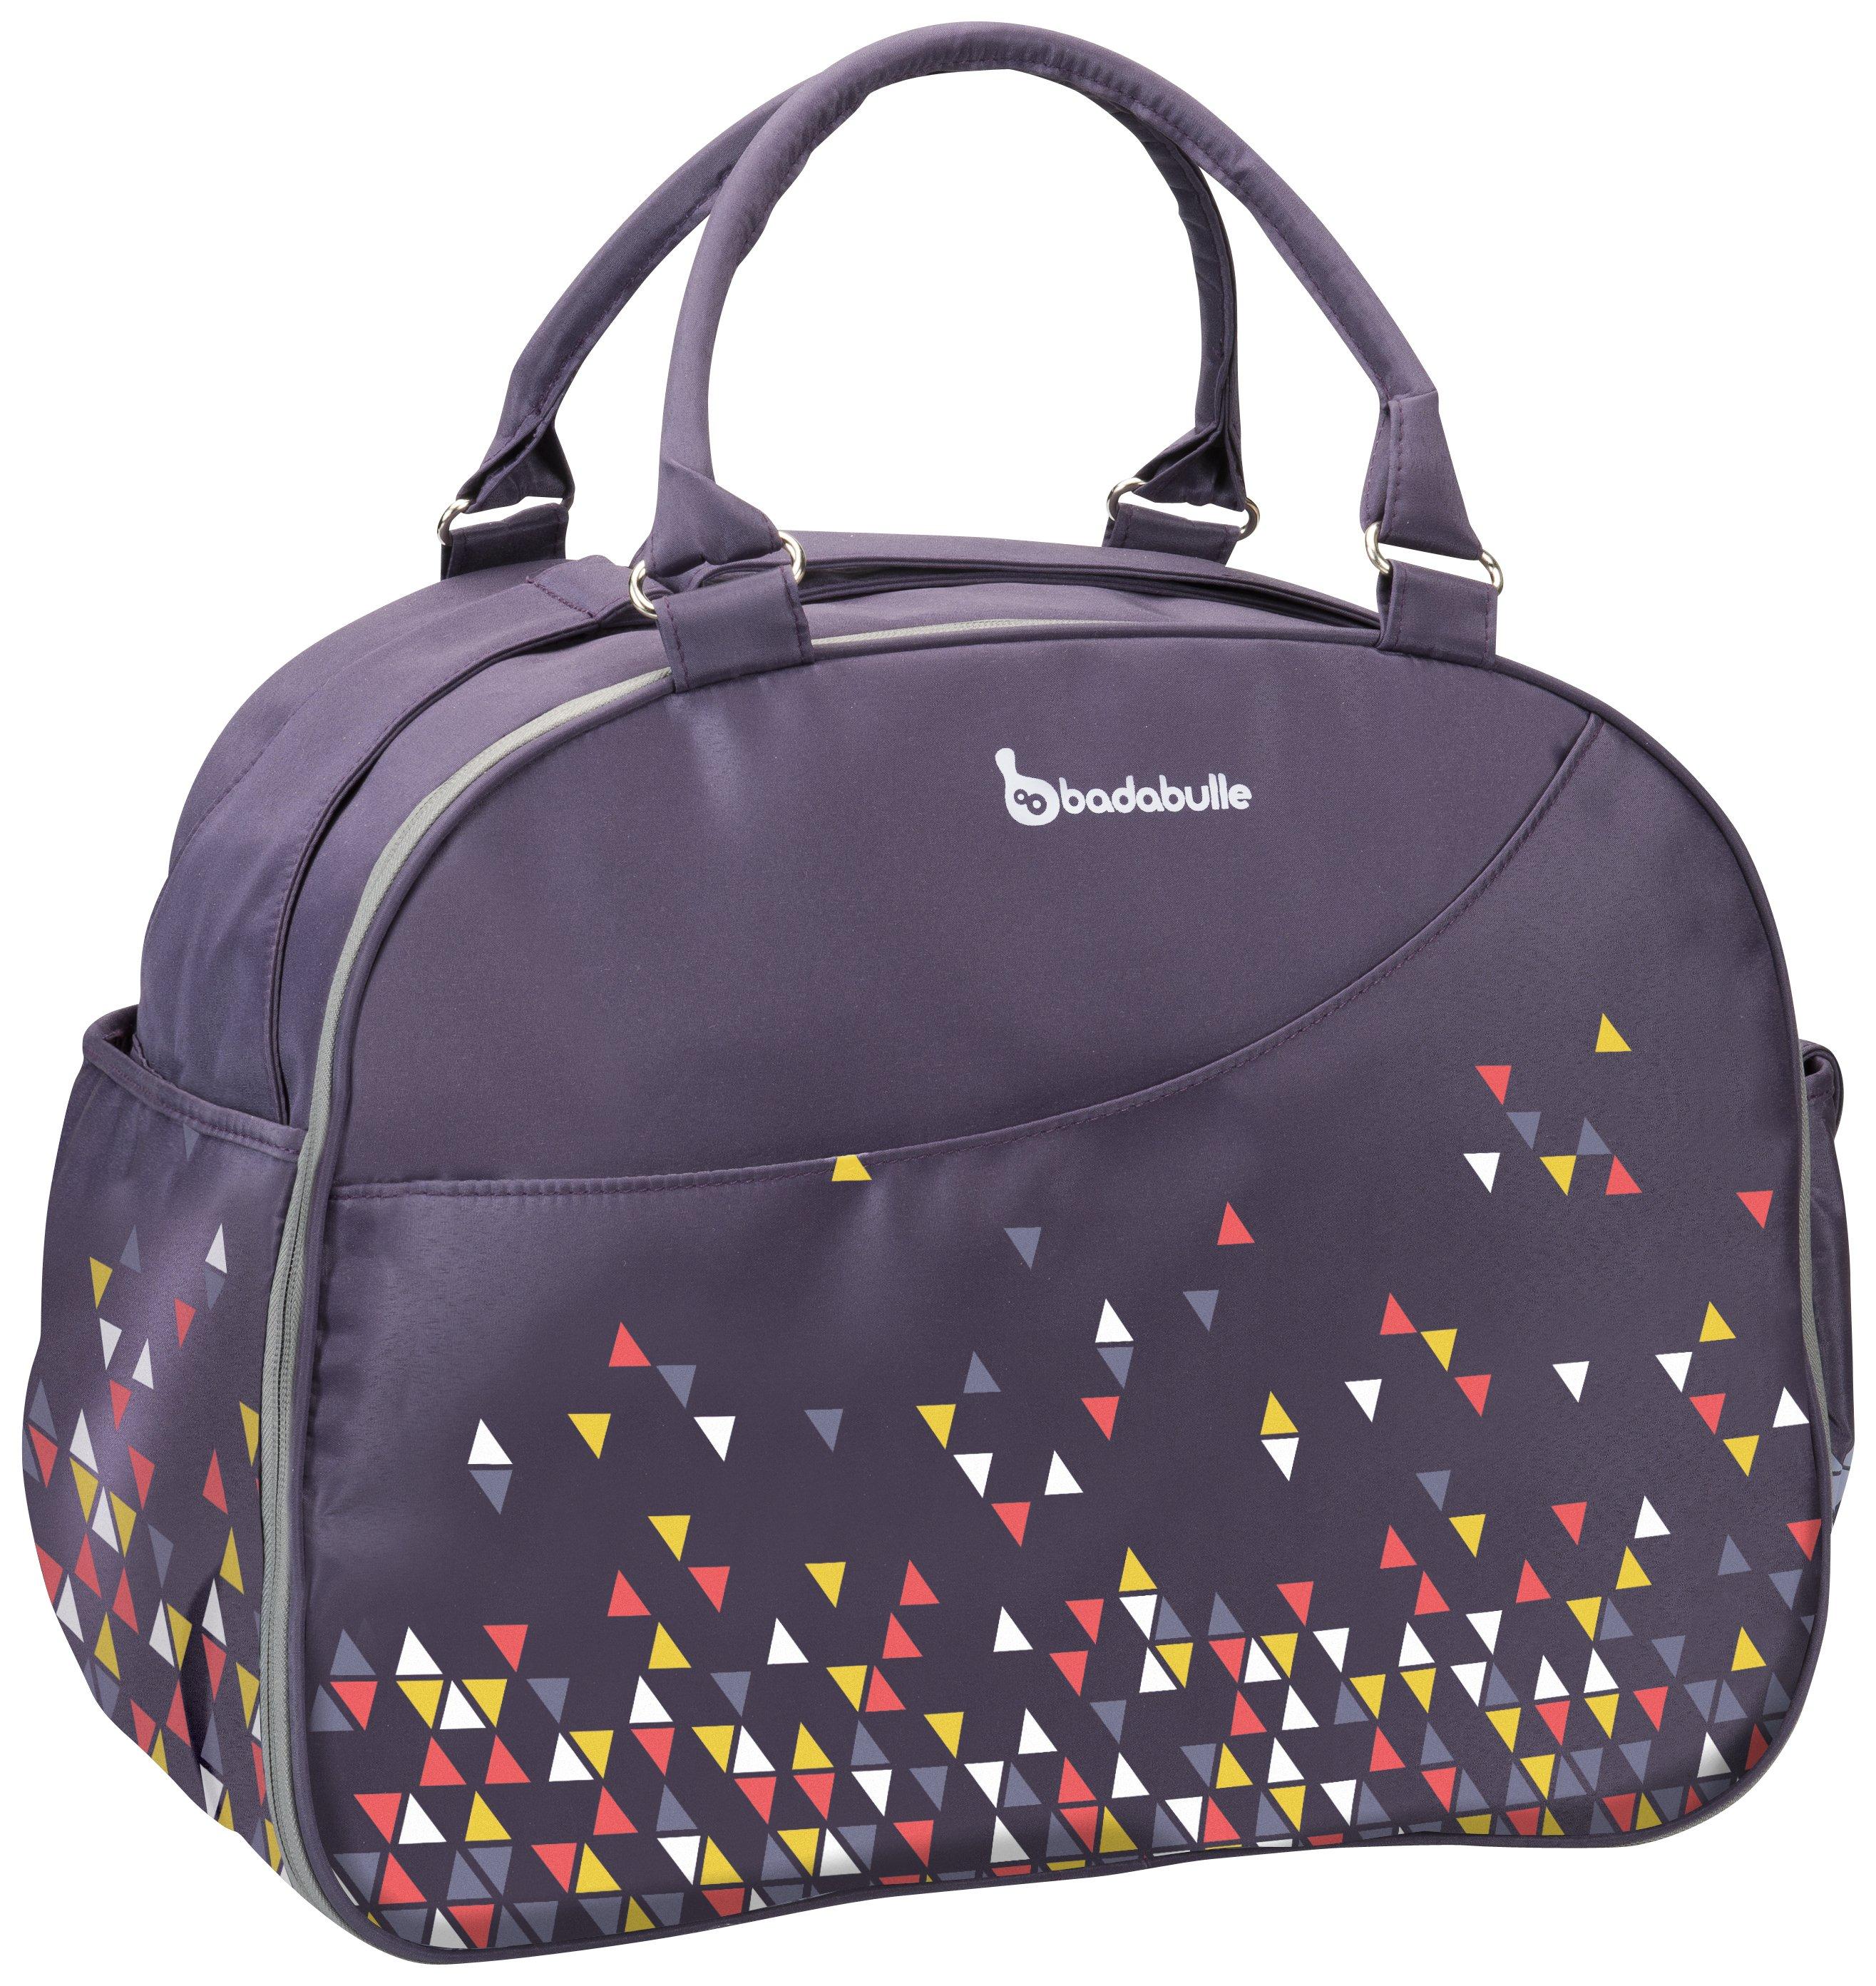 Image of Badabulle Weekend Changing Bag - Confetti Purple.